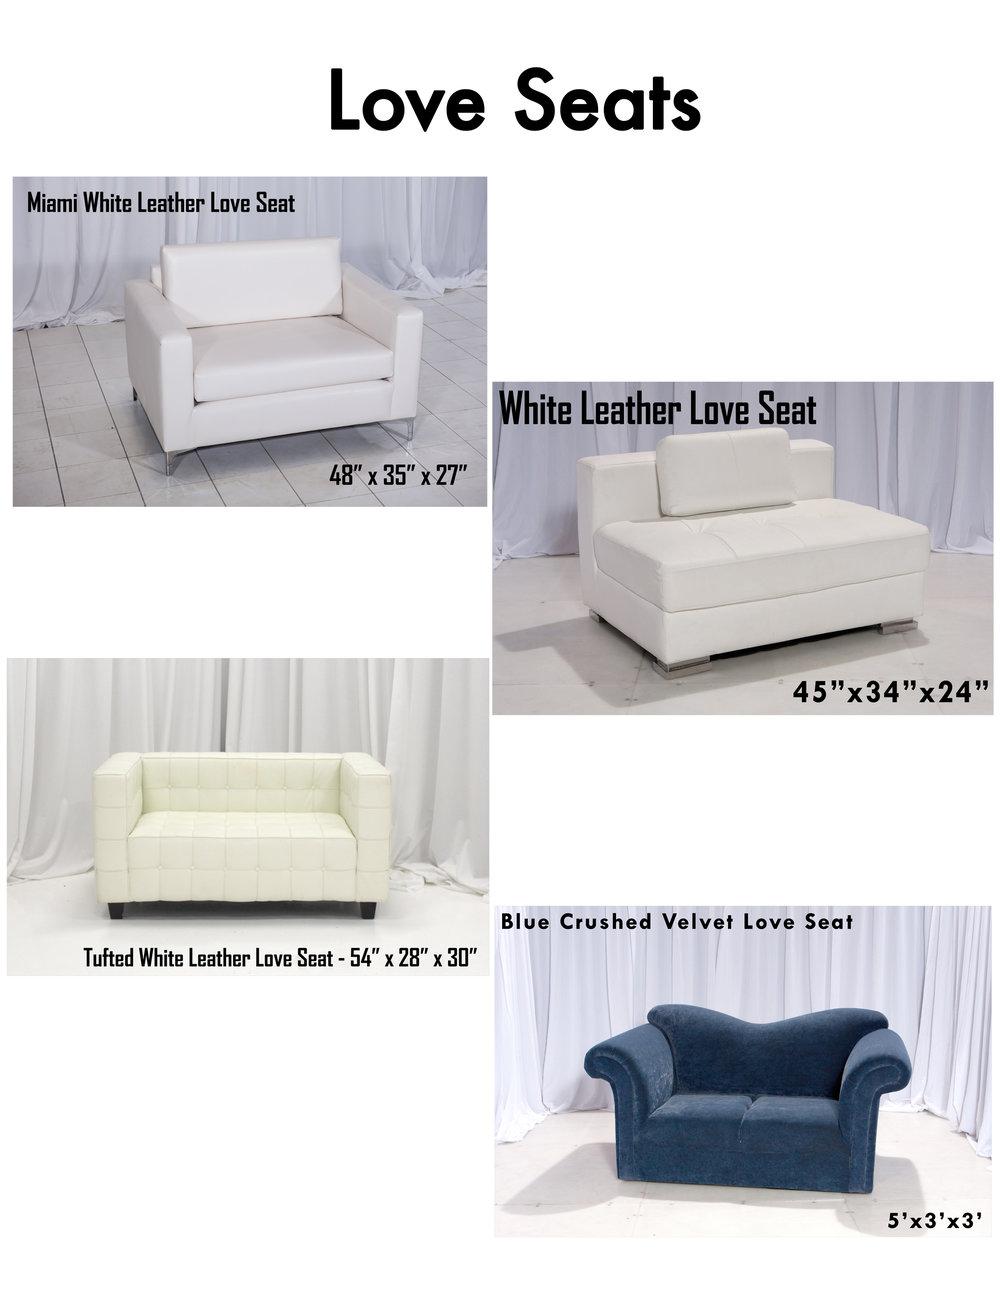 053-P52_Love Seats.jpg